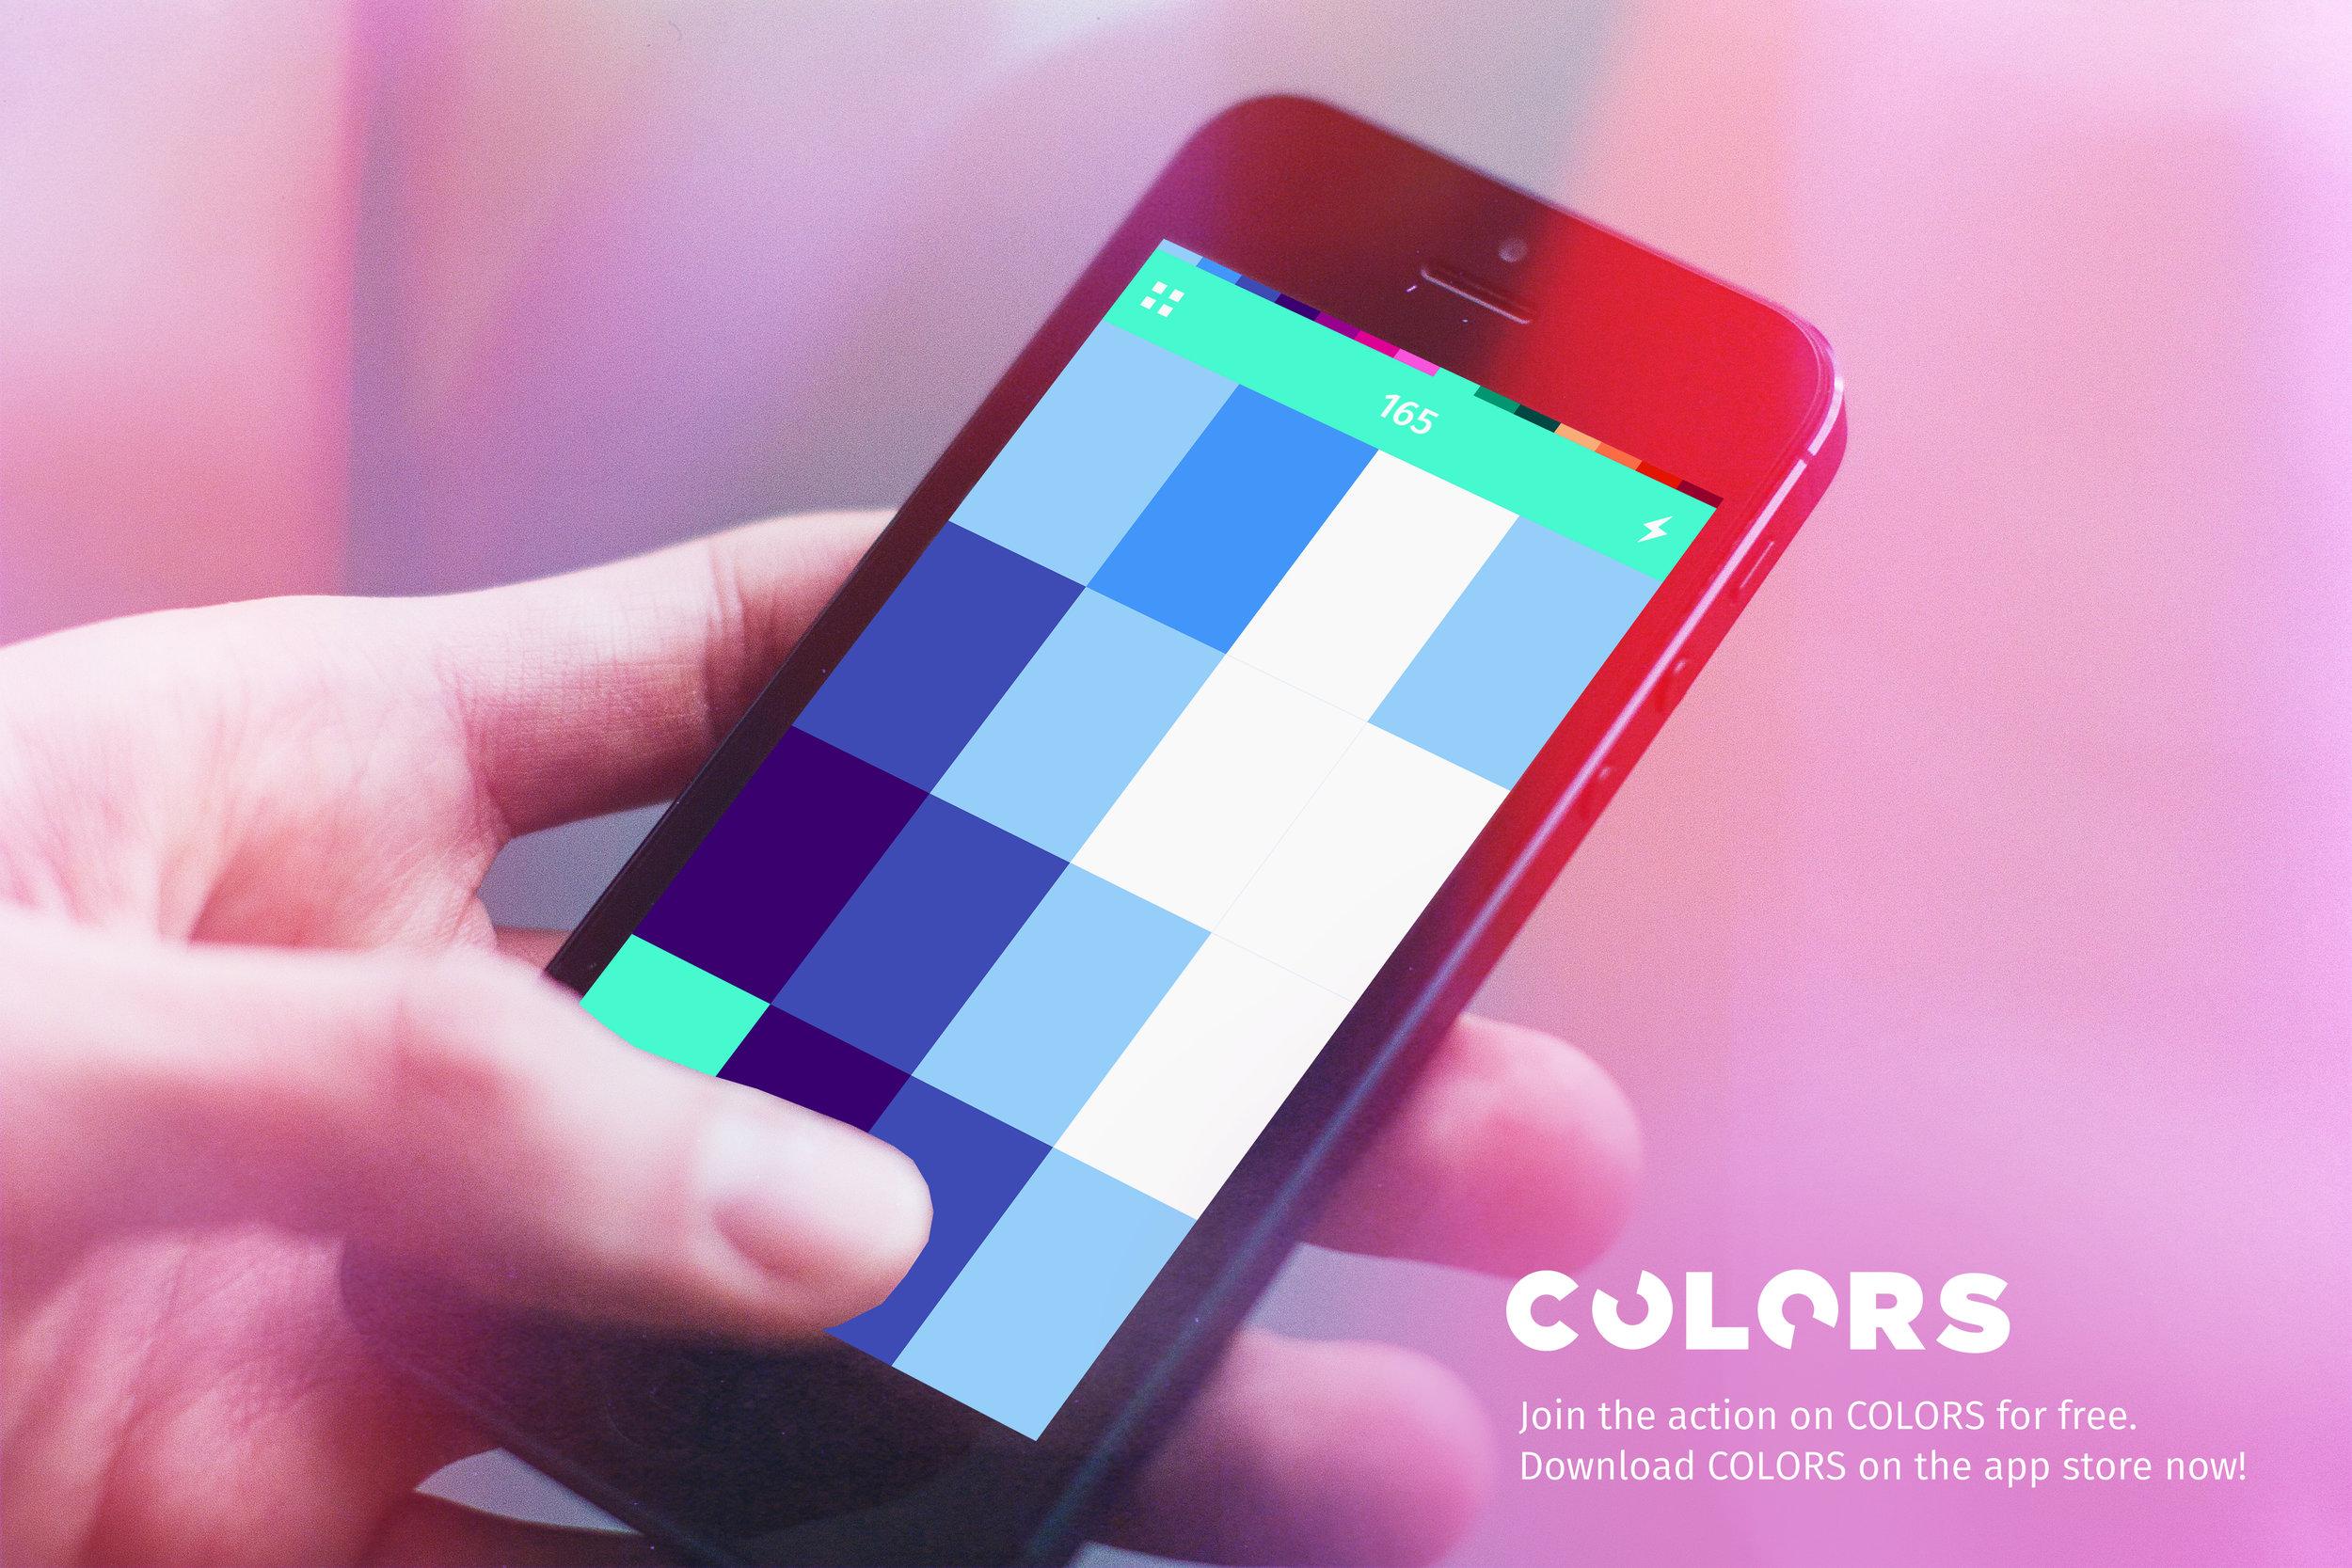 WBCG_Colors_Ad-1.jpg